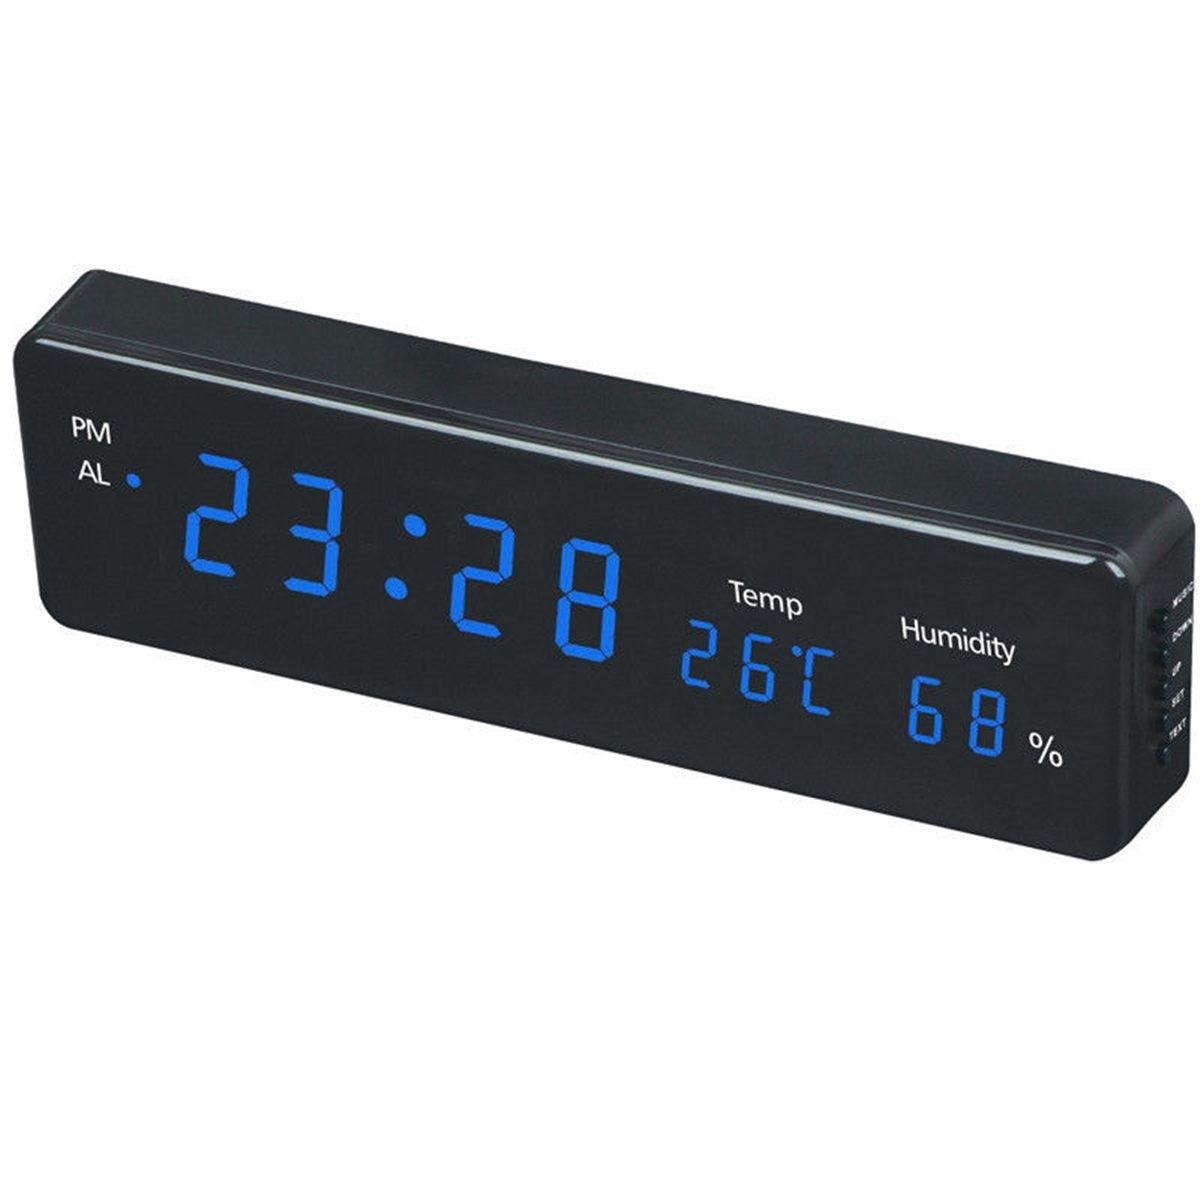 Electronic LED Wall Watch Decor EU Plug Digital Wall Clock Big LED Time Calendar Temperature Humidity Display Desk Table Clocks